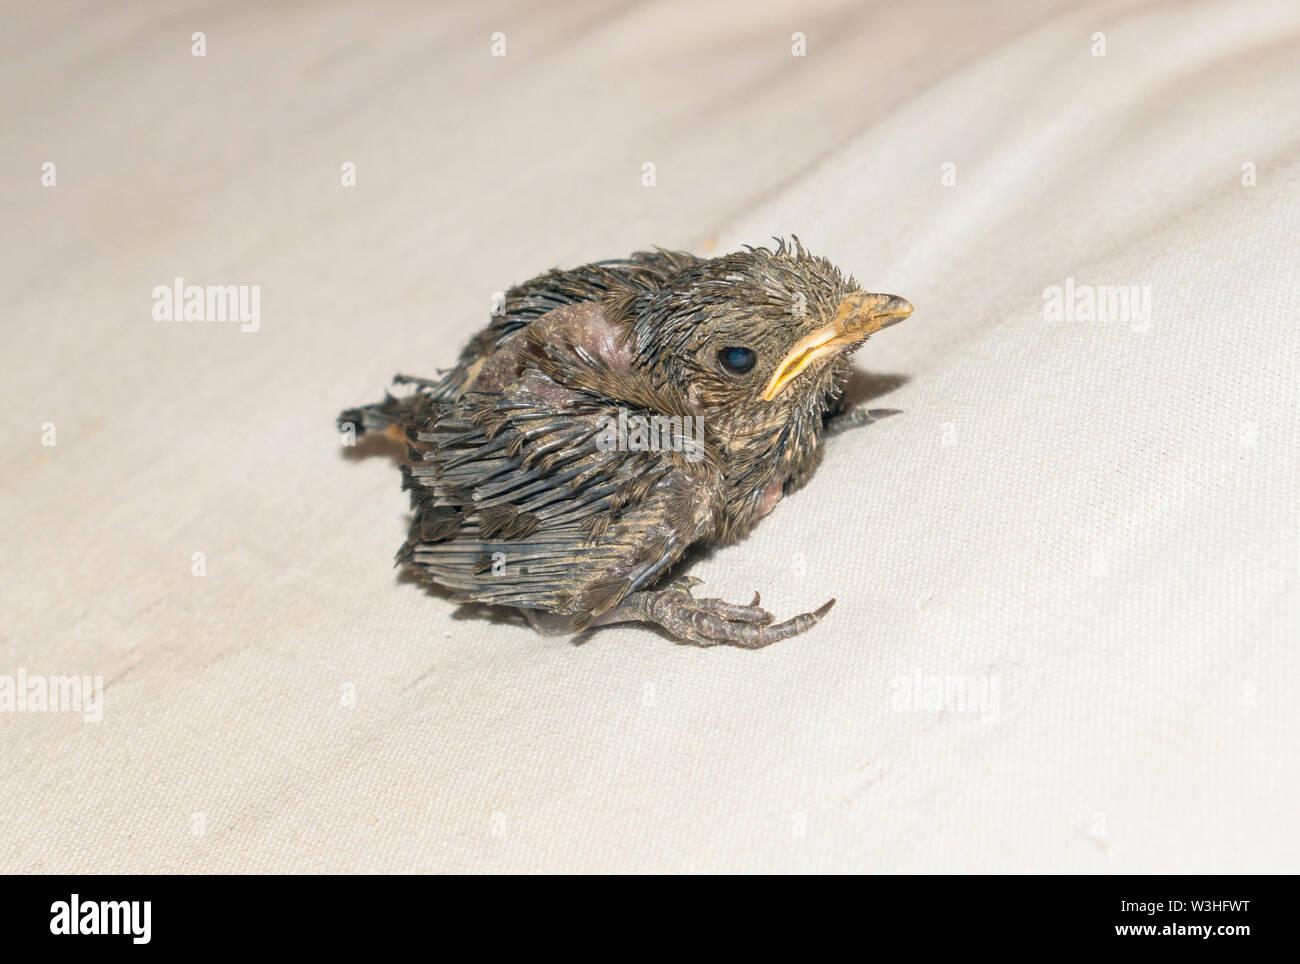 close up of a baby humming bird sitting on white sheet,white background. Stock Photo